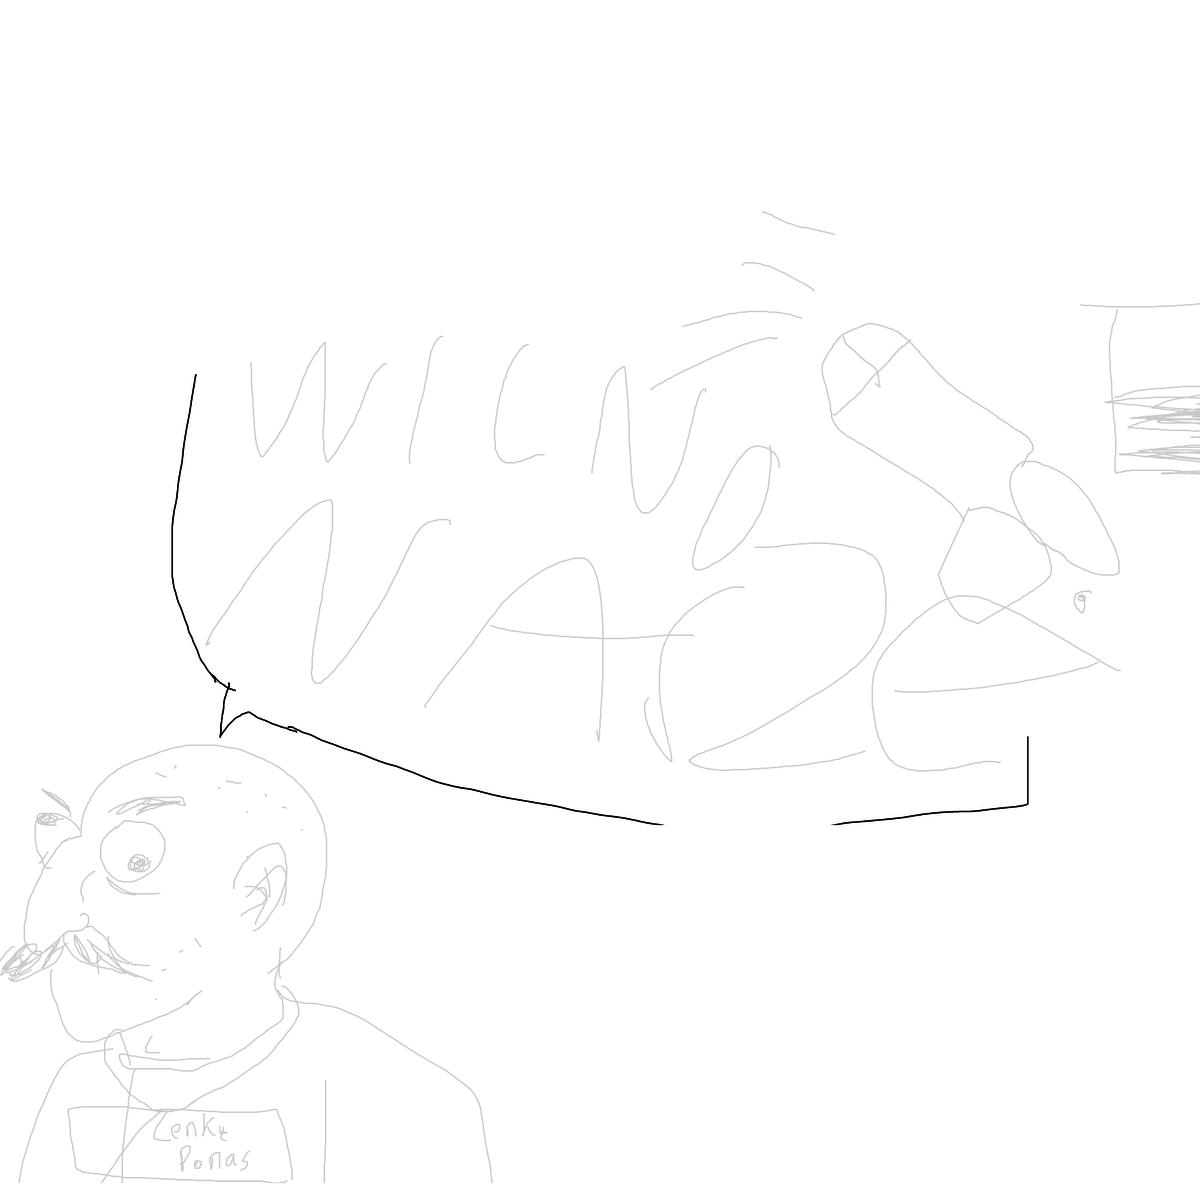 BAAAM drawing#15012 lat:54.6778564453125000lng: 25.2793025970459000